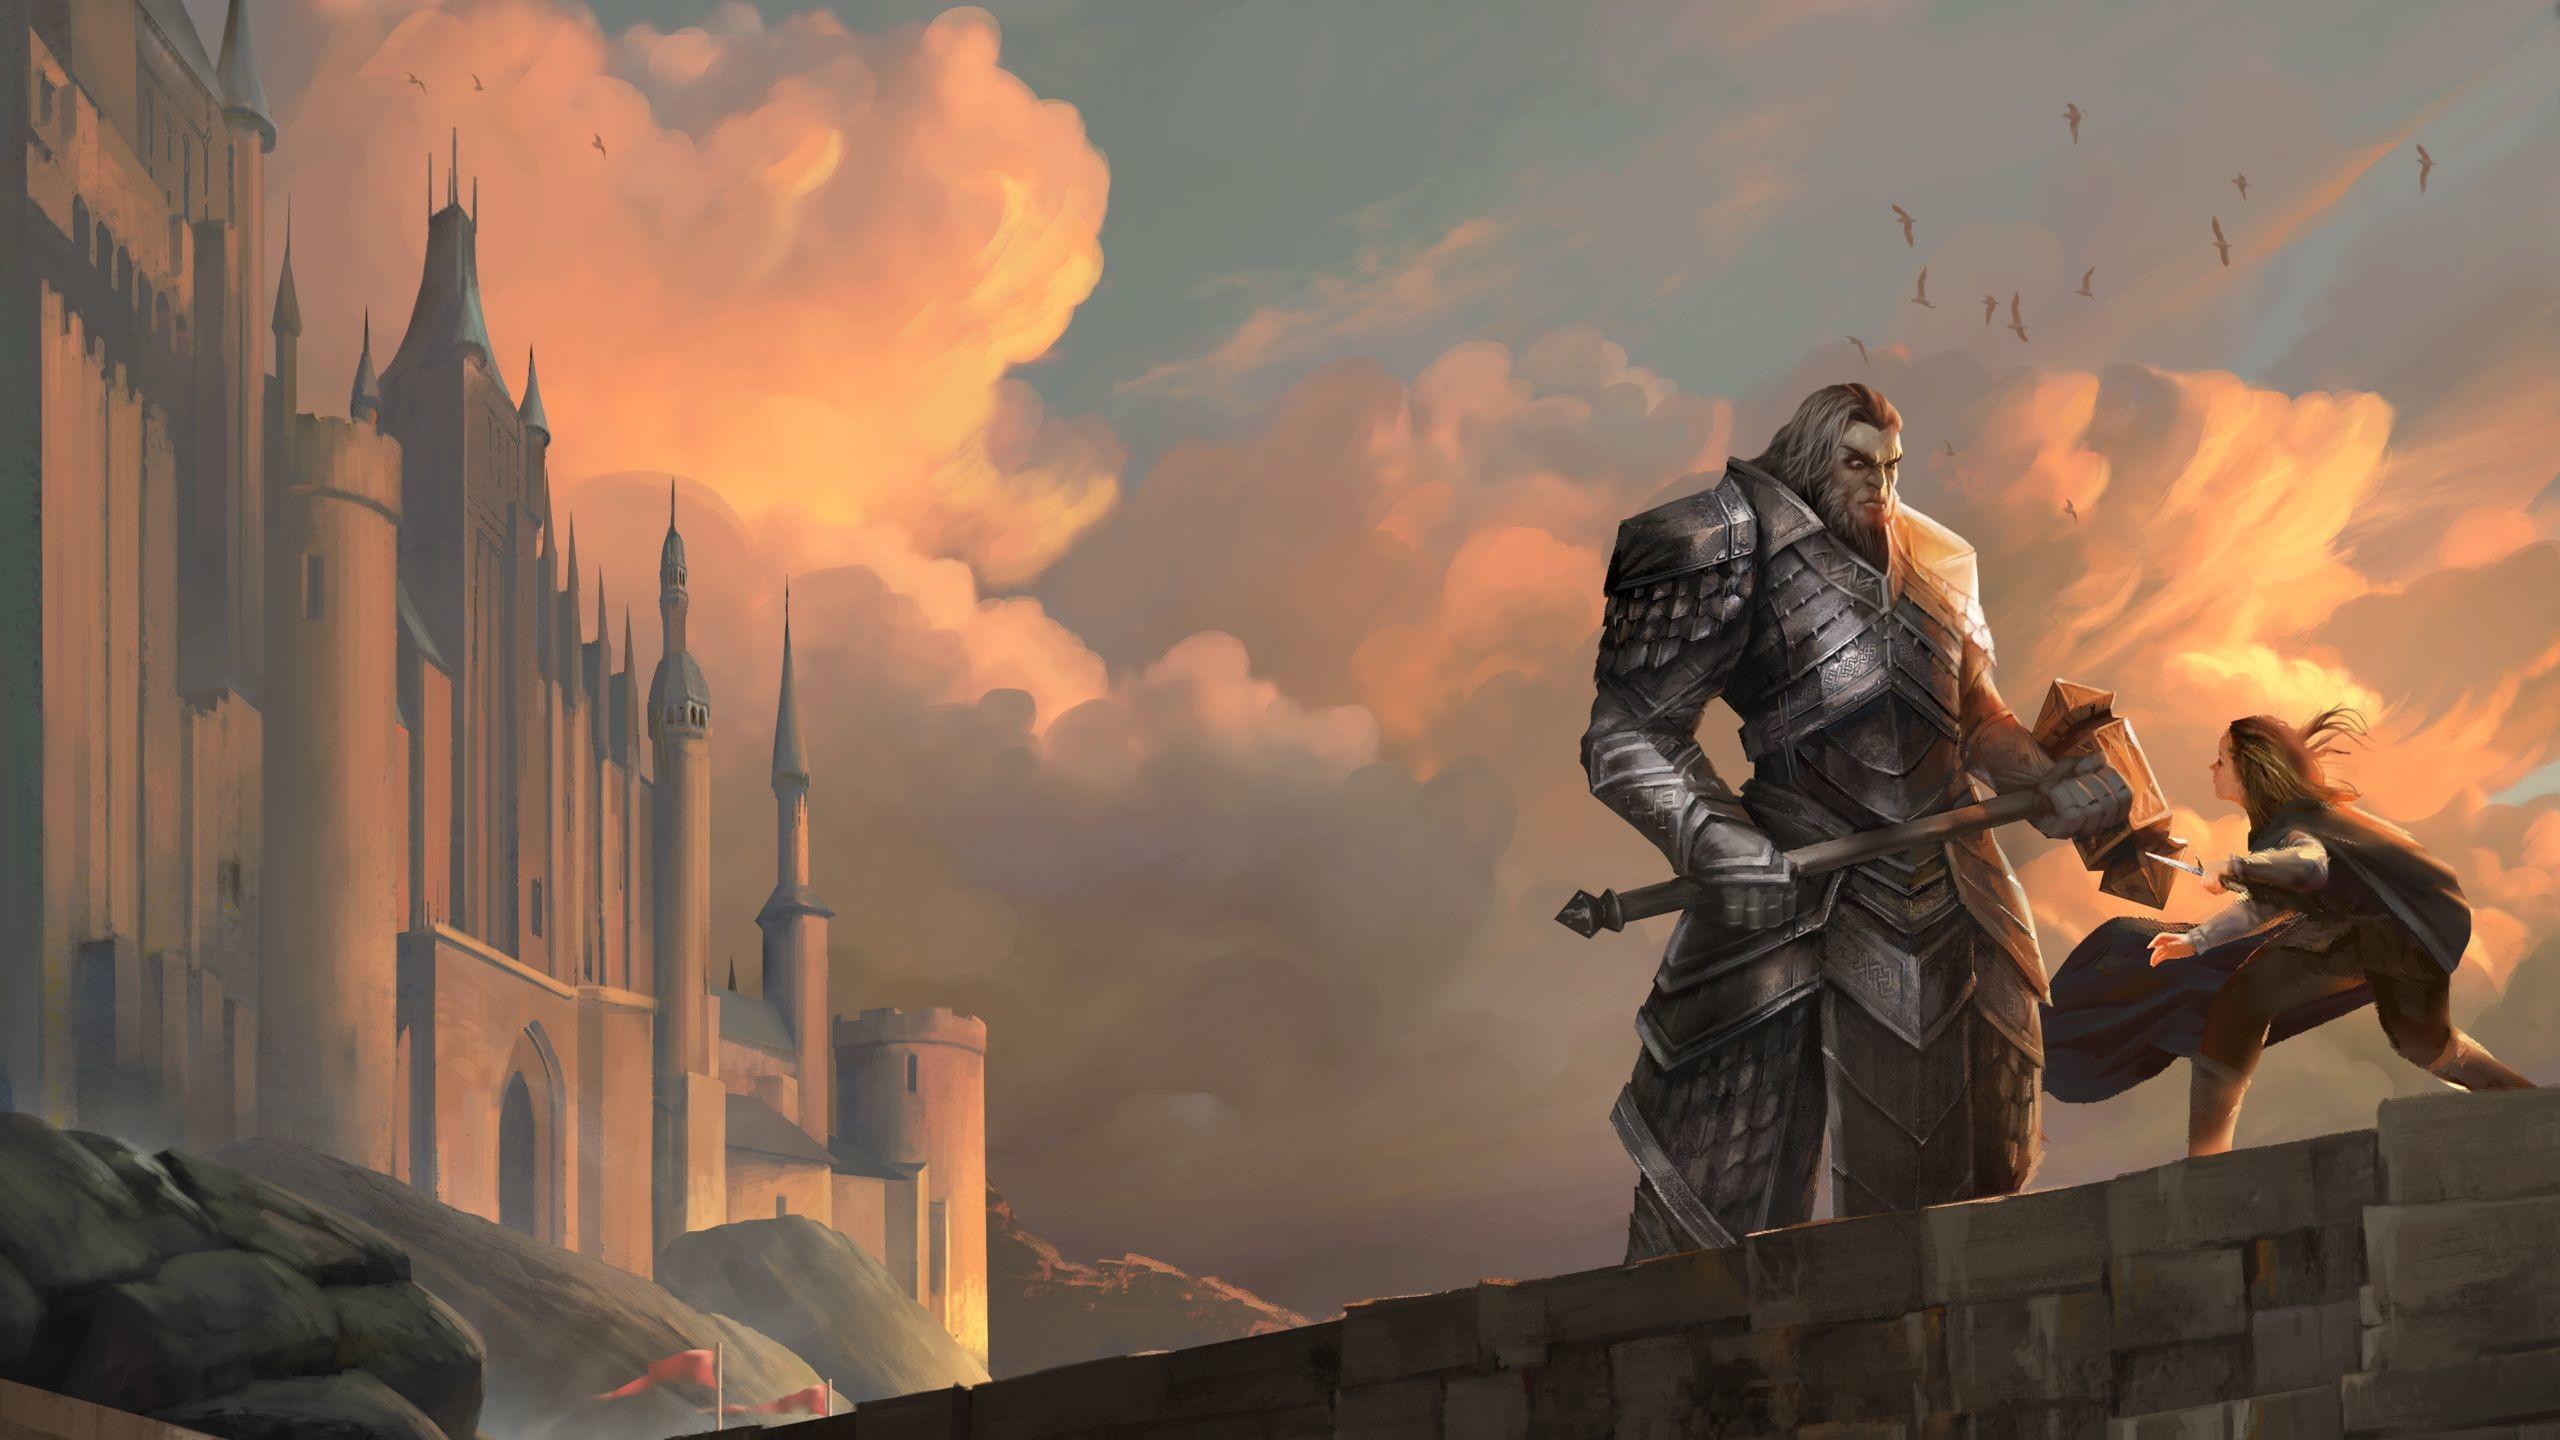 Res: 2560x1440, Nightblade Epic Battle Scene Landscape Wallpaper